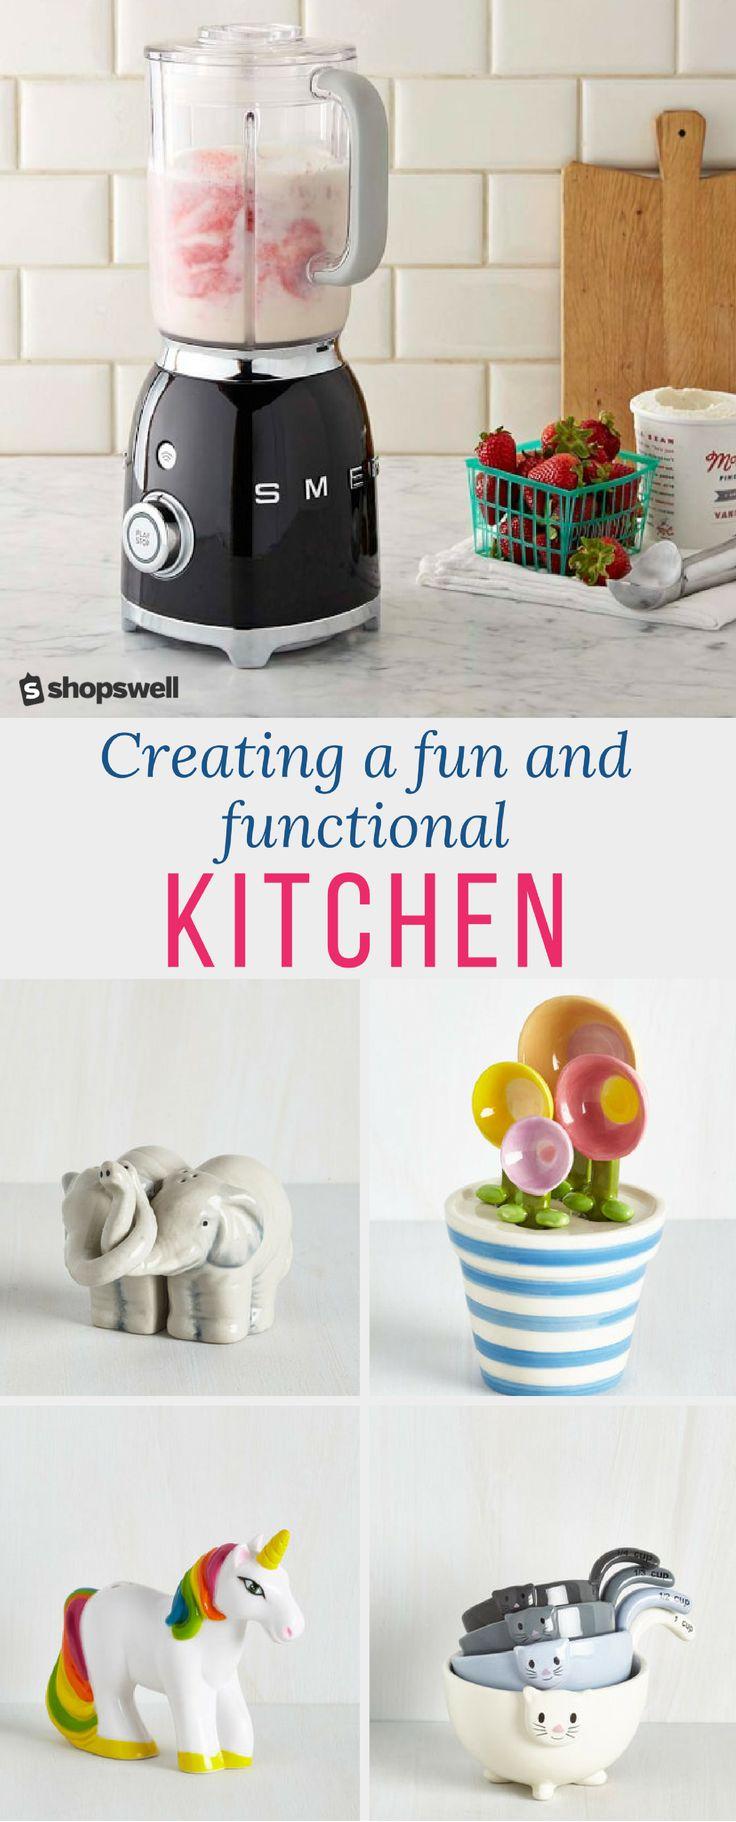 523 best Kitchen Essentials images on Pinterest   Cooking appliances ...